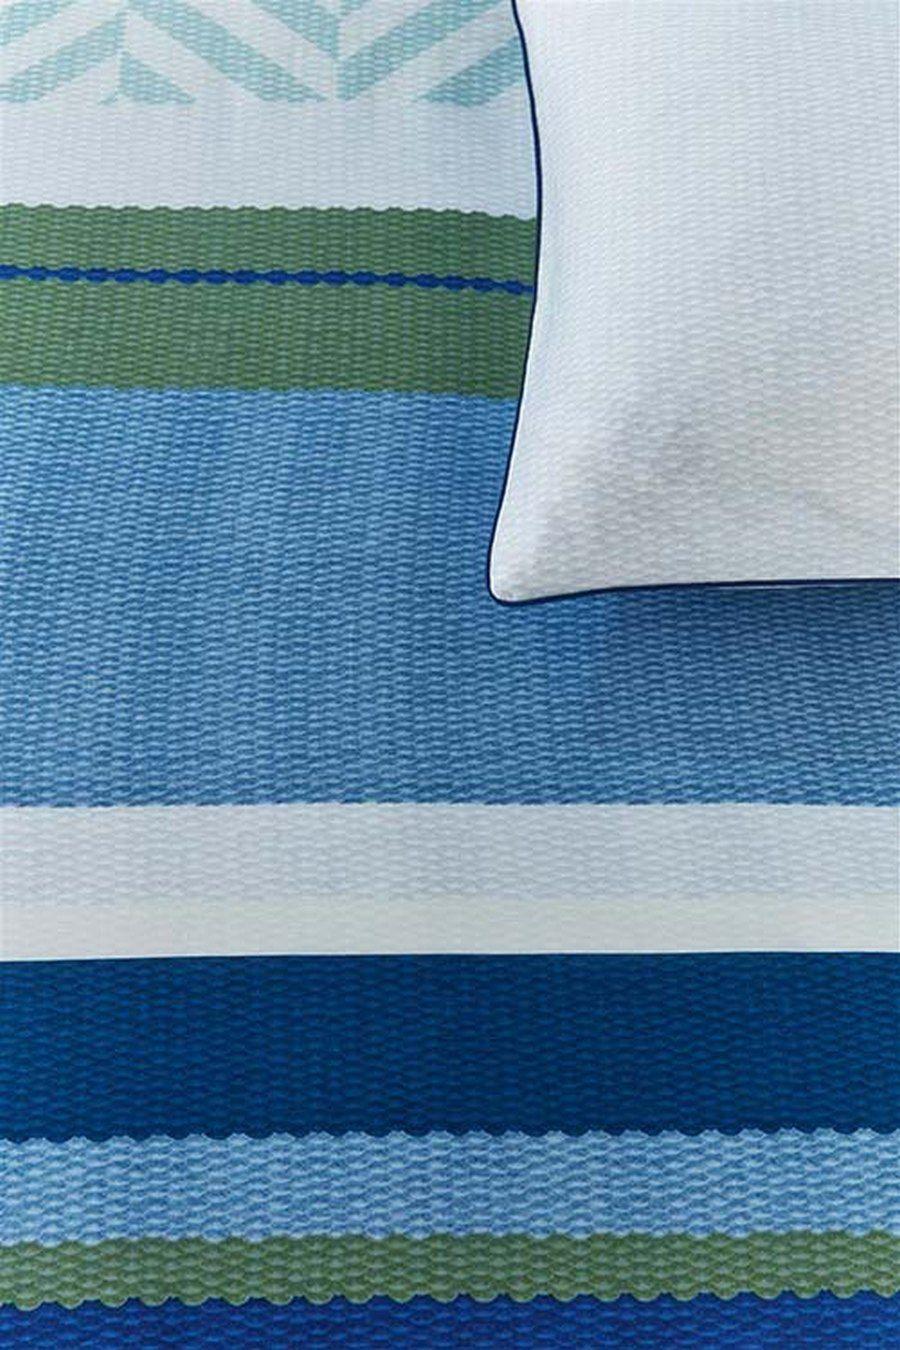 Oilily - Parachute blue dekbedovertrek